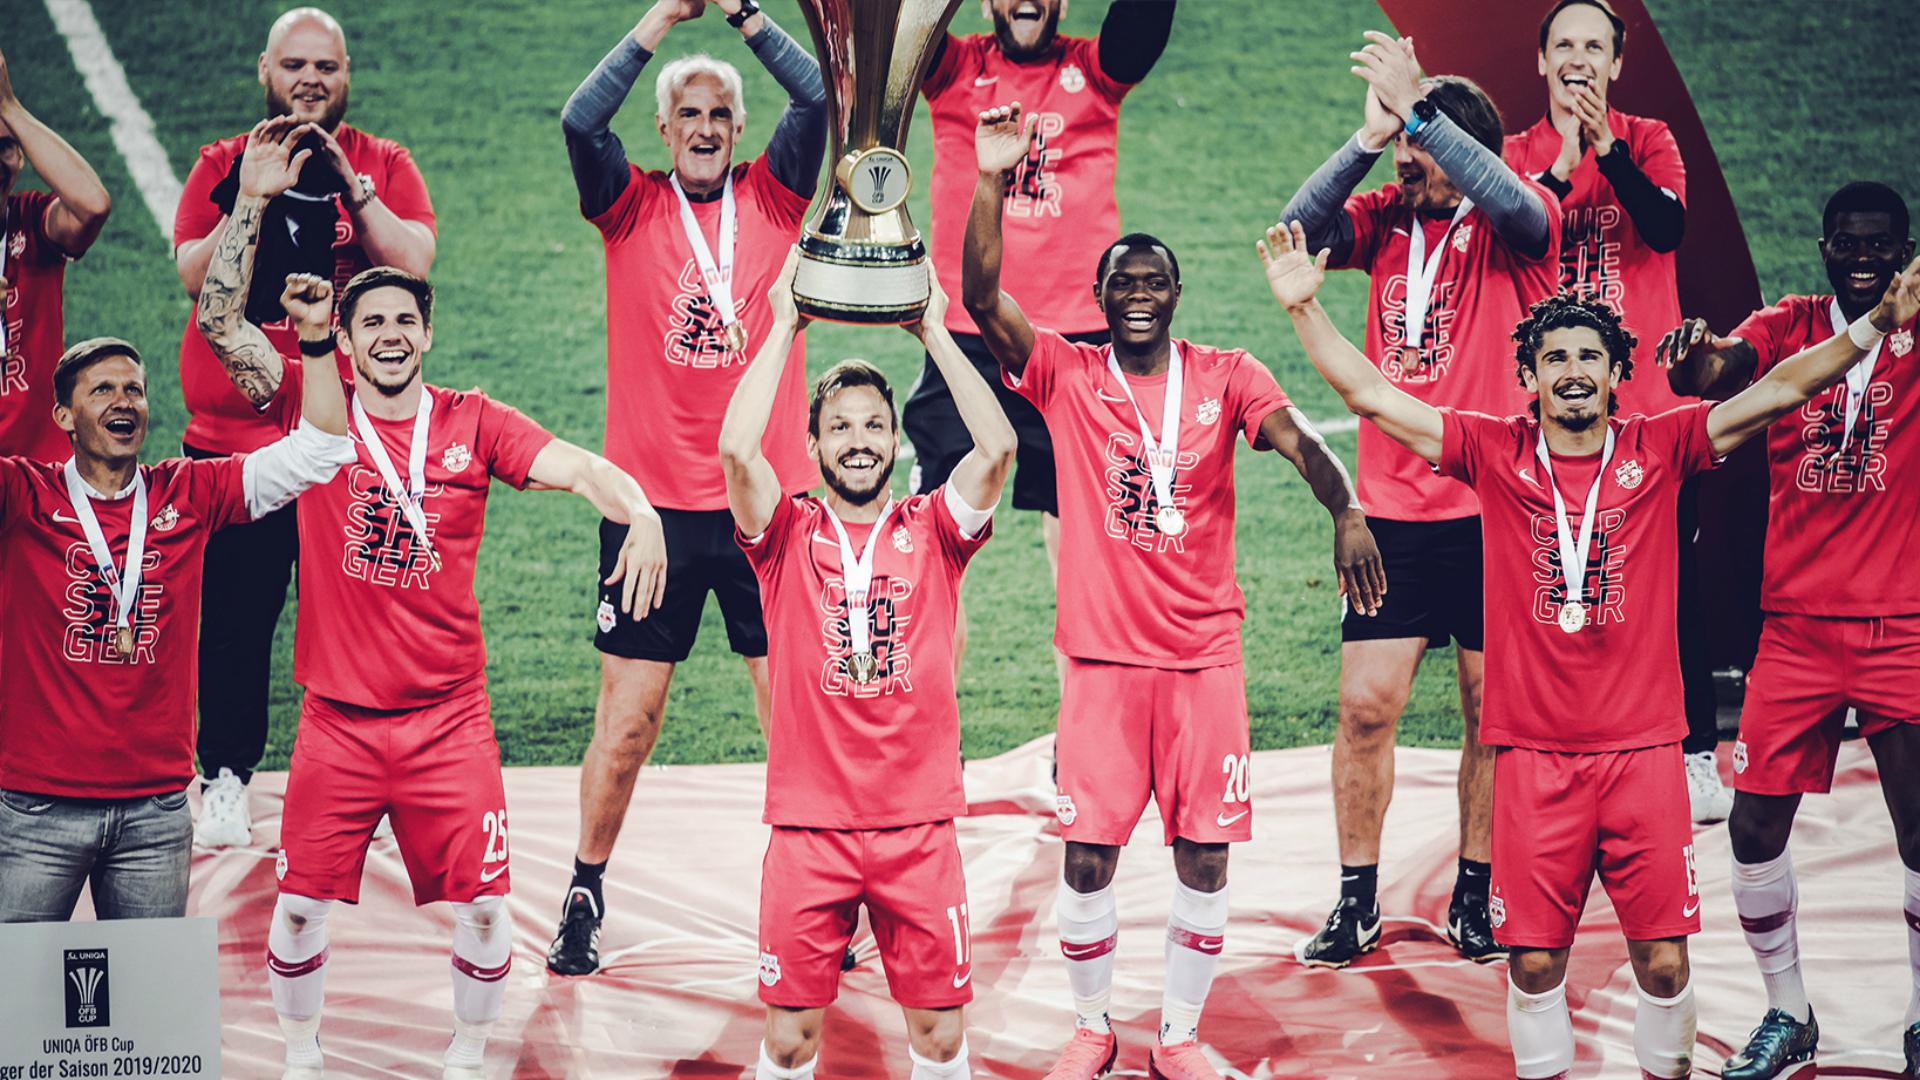 Coronavirus: Salzburg celebrate cup success in socially distant fashion as season restarts